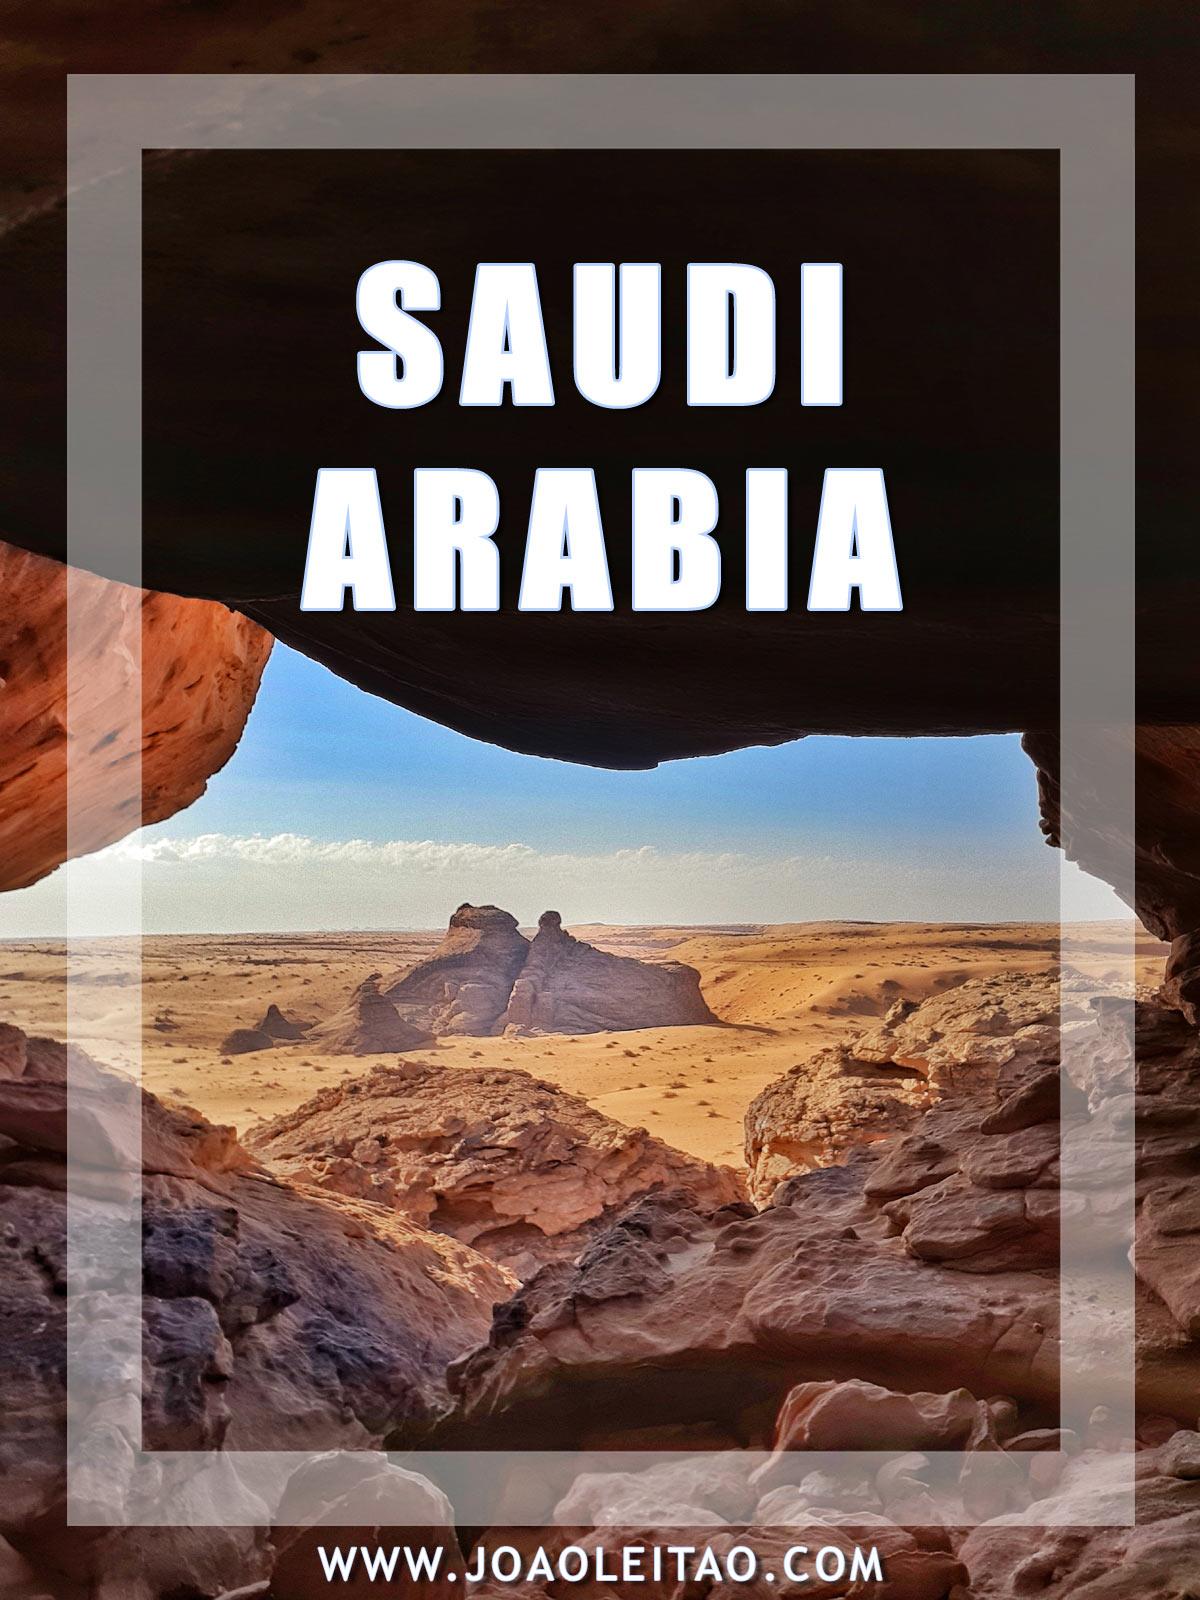 VISIT SAUDI ARABIA - PHOTOS